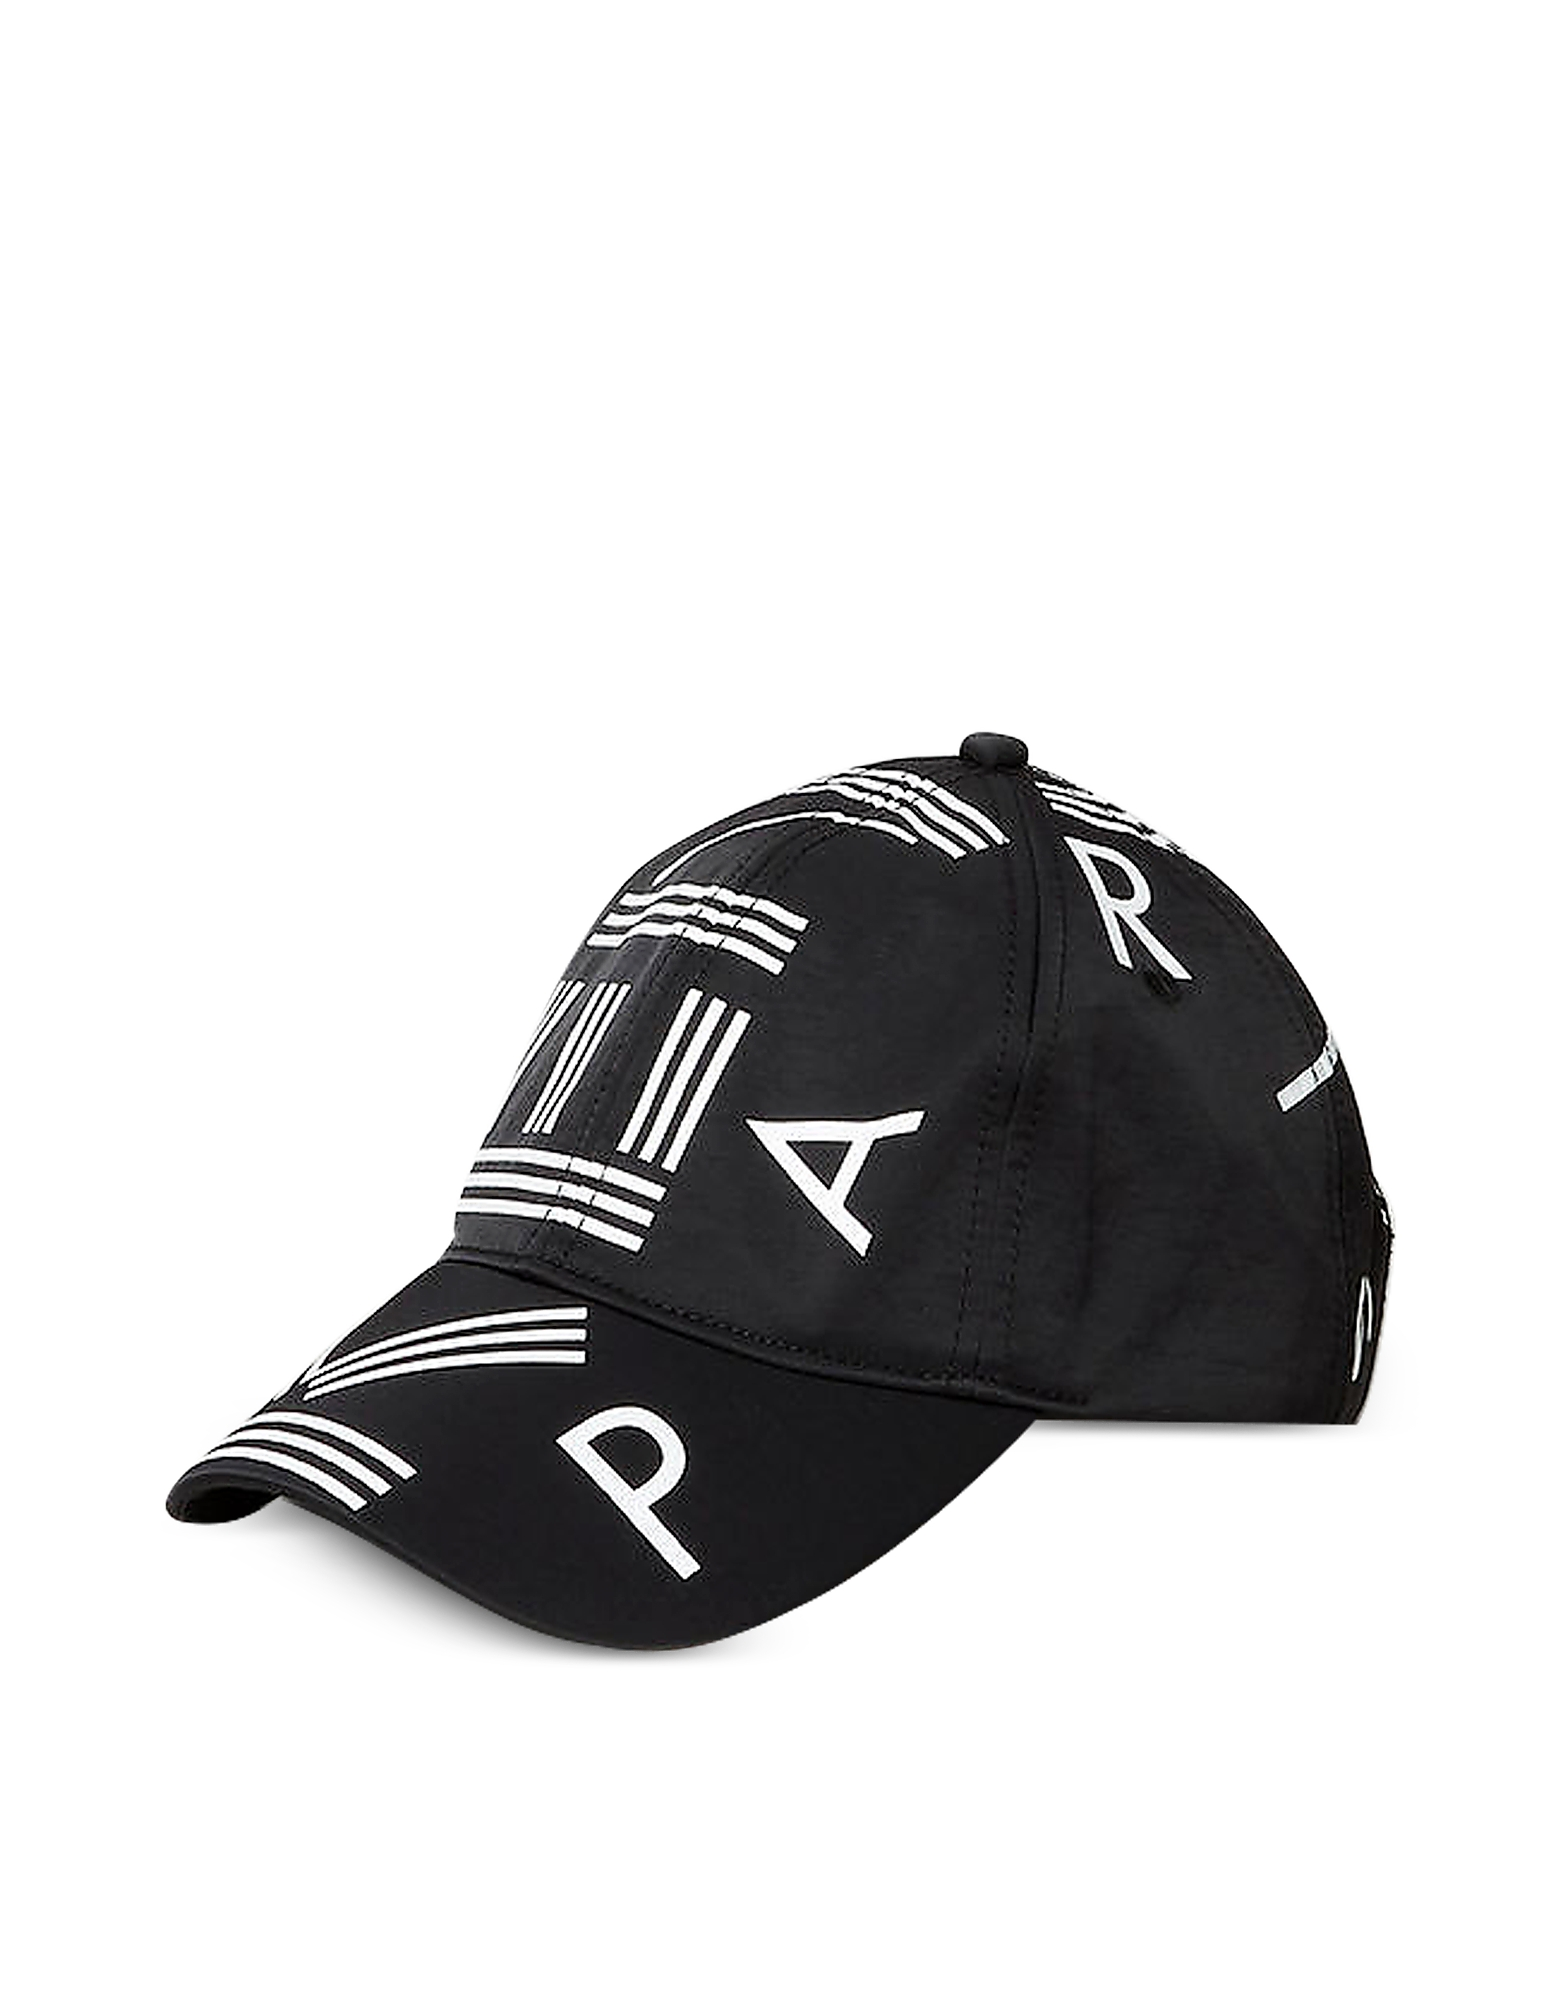 Kenzo Men's Hats, Black Nylon Kenzo Logo Sport Baseball Cap